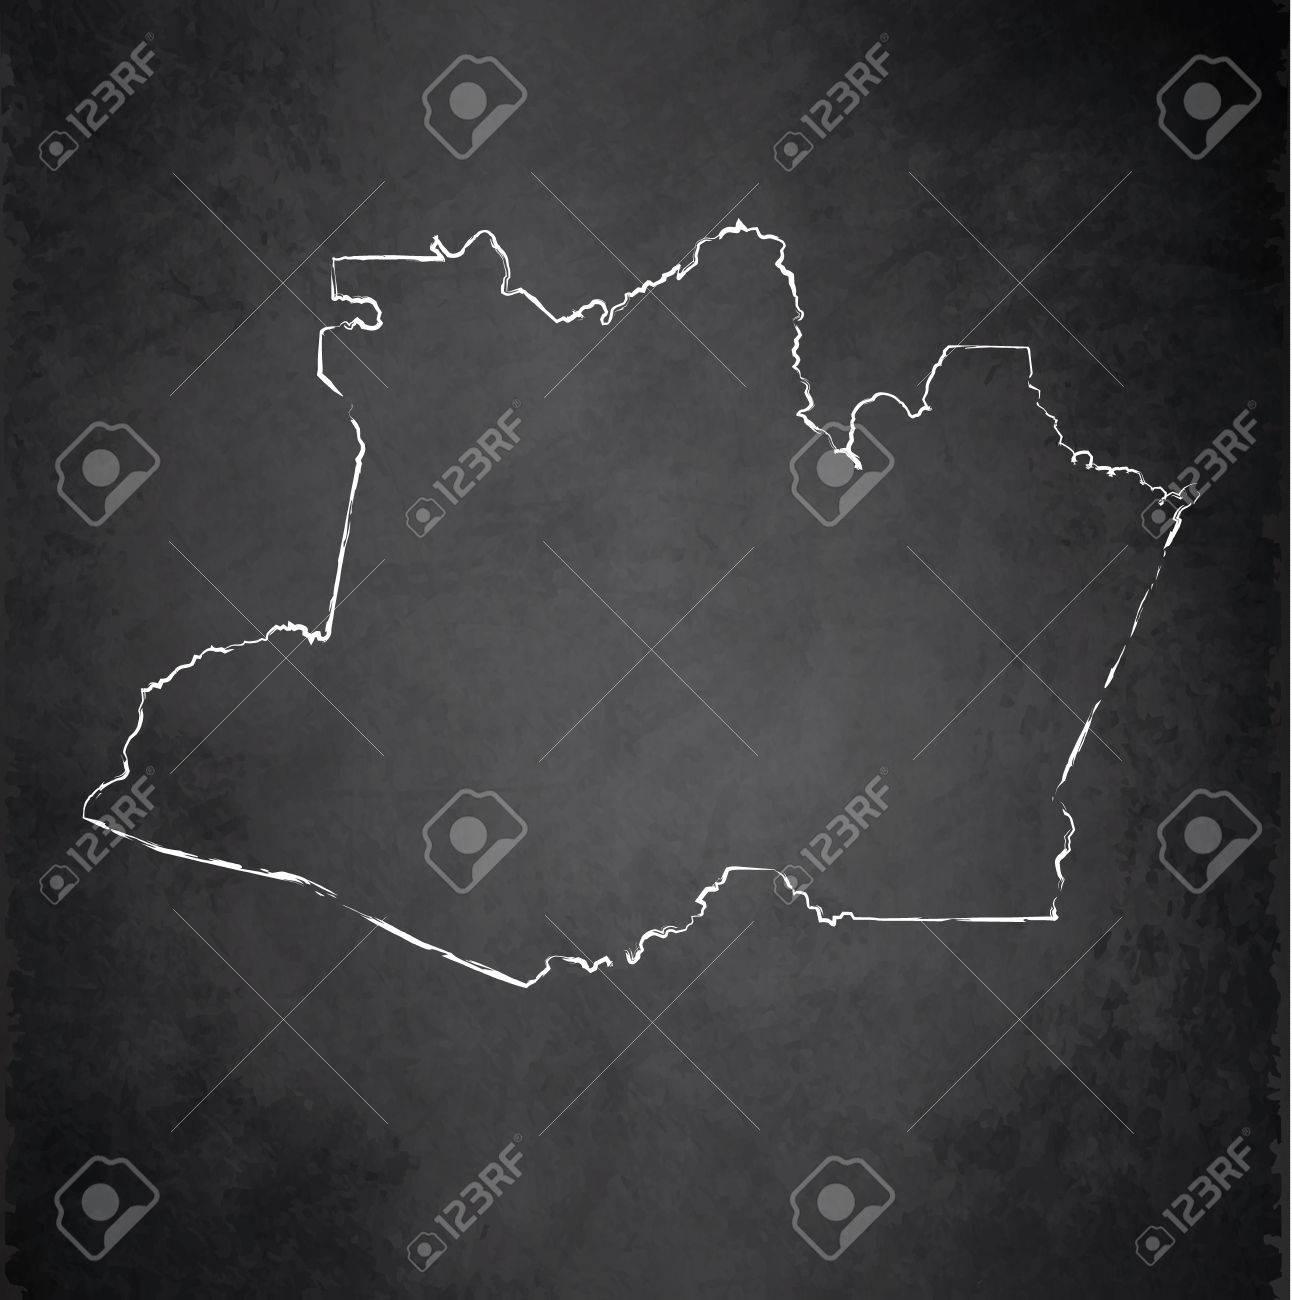 amazonia blackboard chalkboard raster maps stock photo picture and